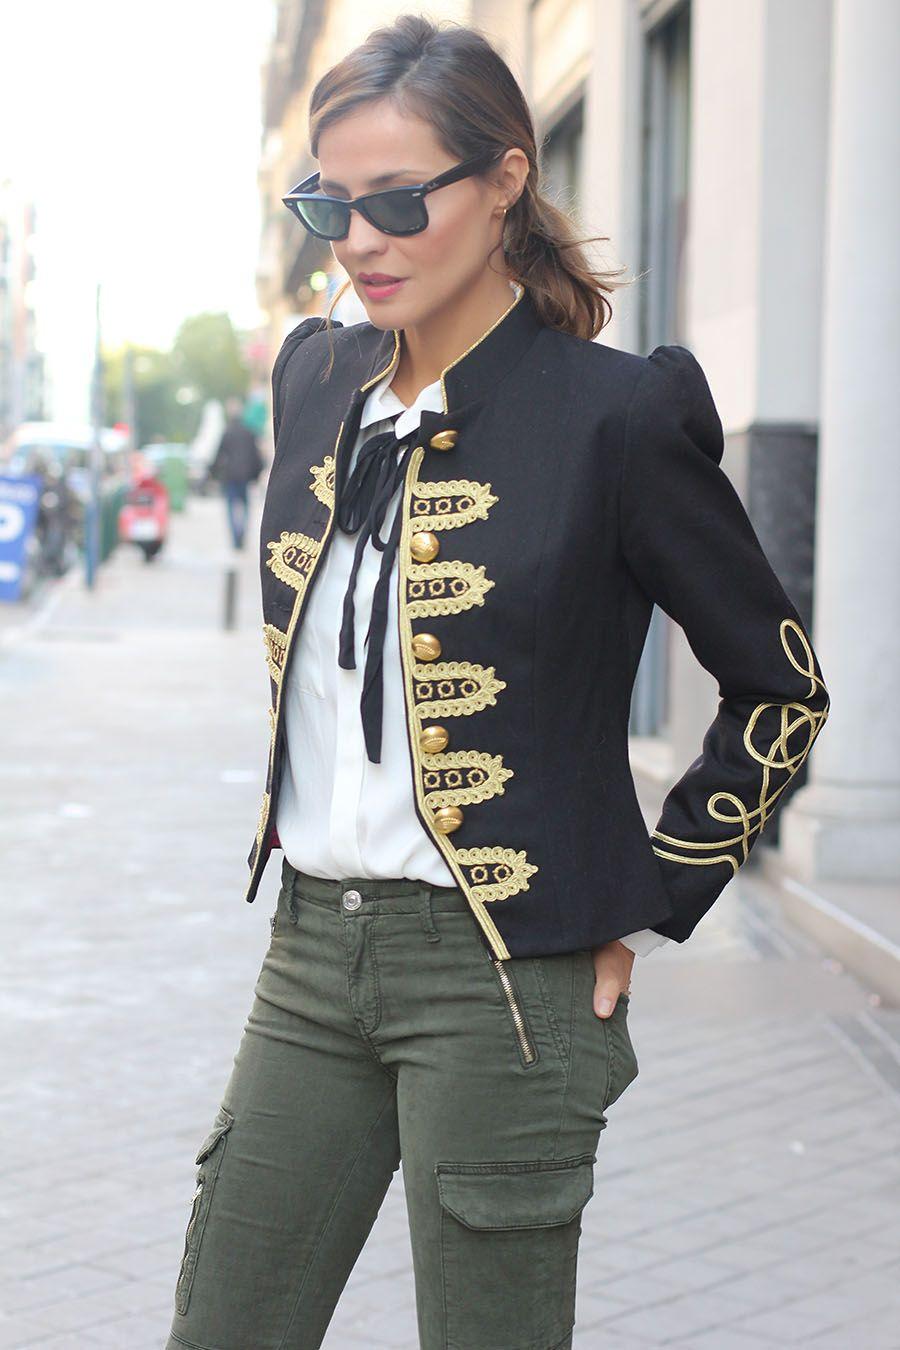 venta caliente online ce4b5 51280 La Condesa jacket   Fashion Inspiration for Fall and Winter ...